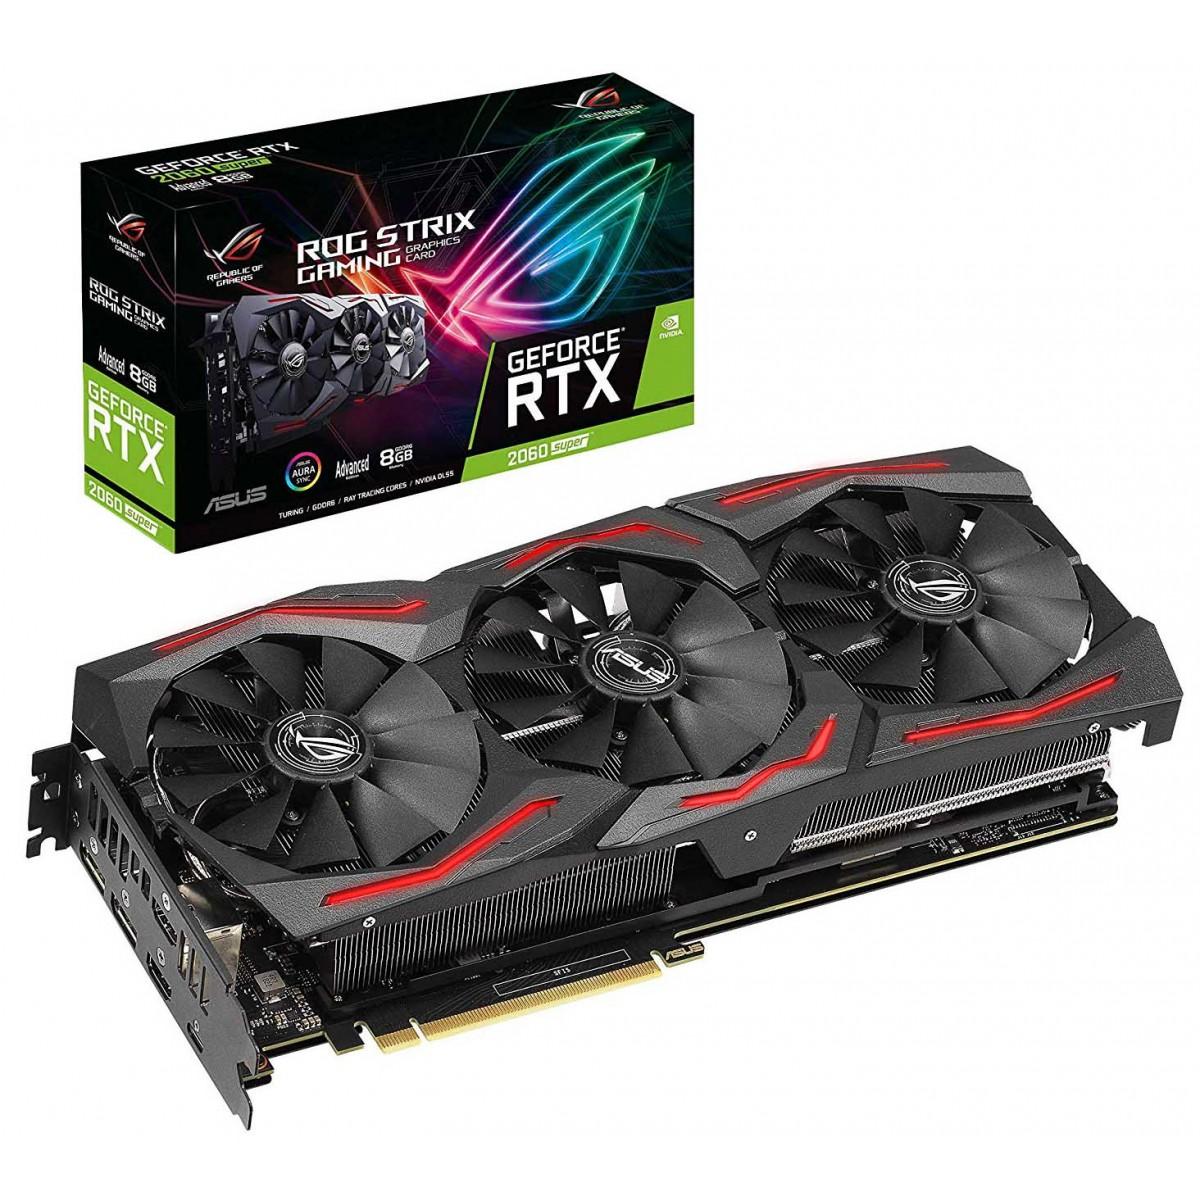 Placa de Vídeo Asus, GeForce, RTX 2060 Super Rog Strix Gaming, 8GB, GDDR6, 256Bit, ROG-STRIX-RTX2060S-A8G-GAMING